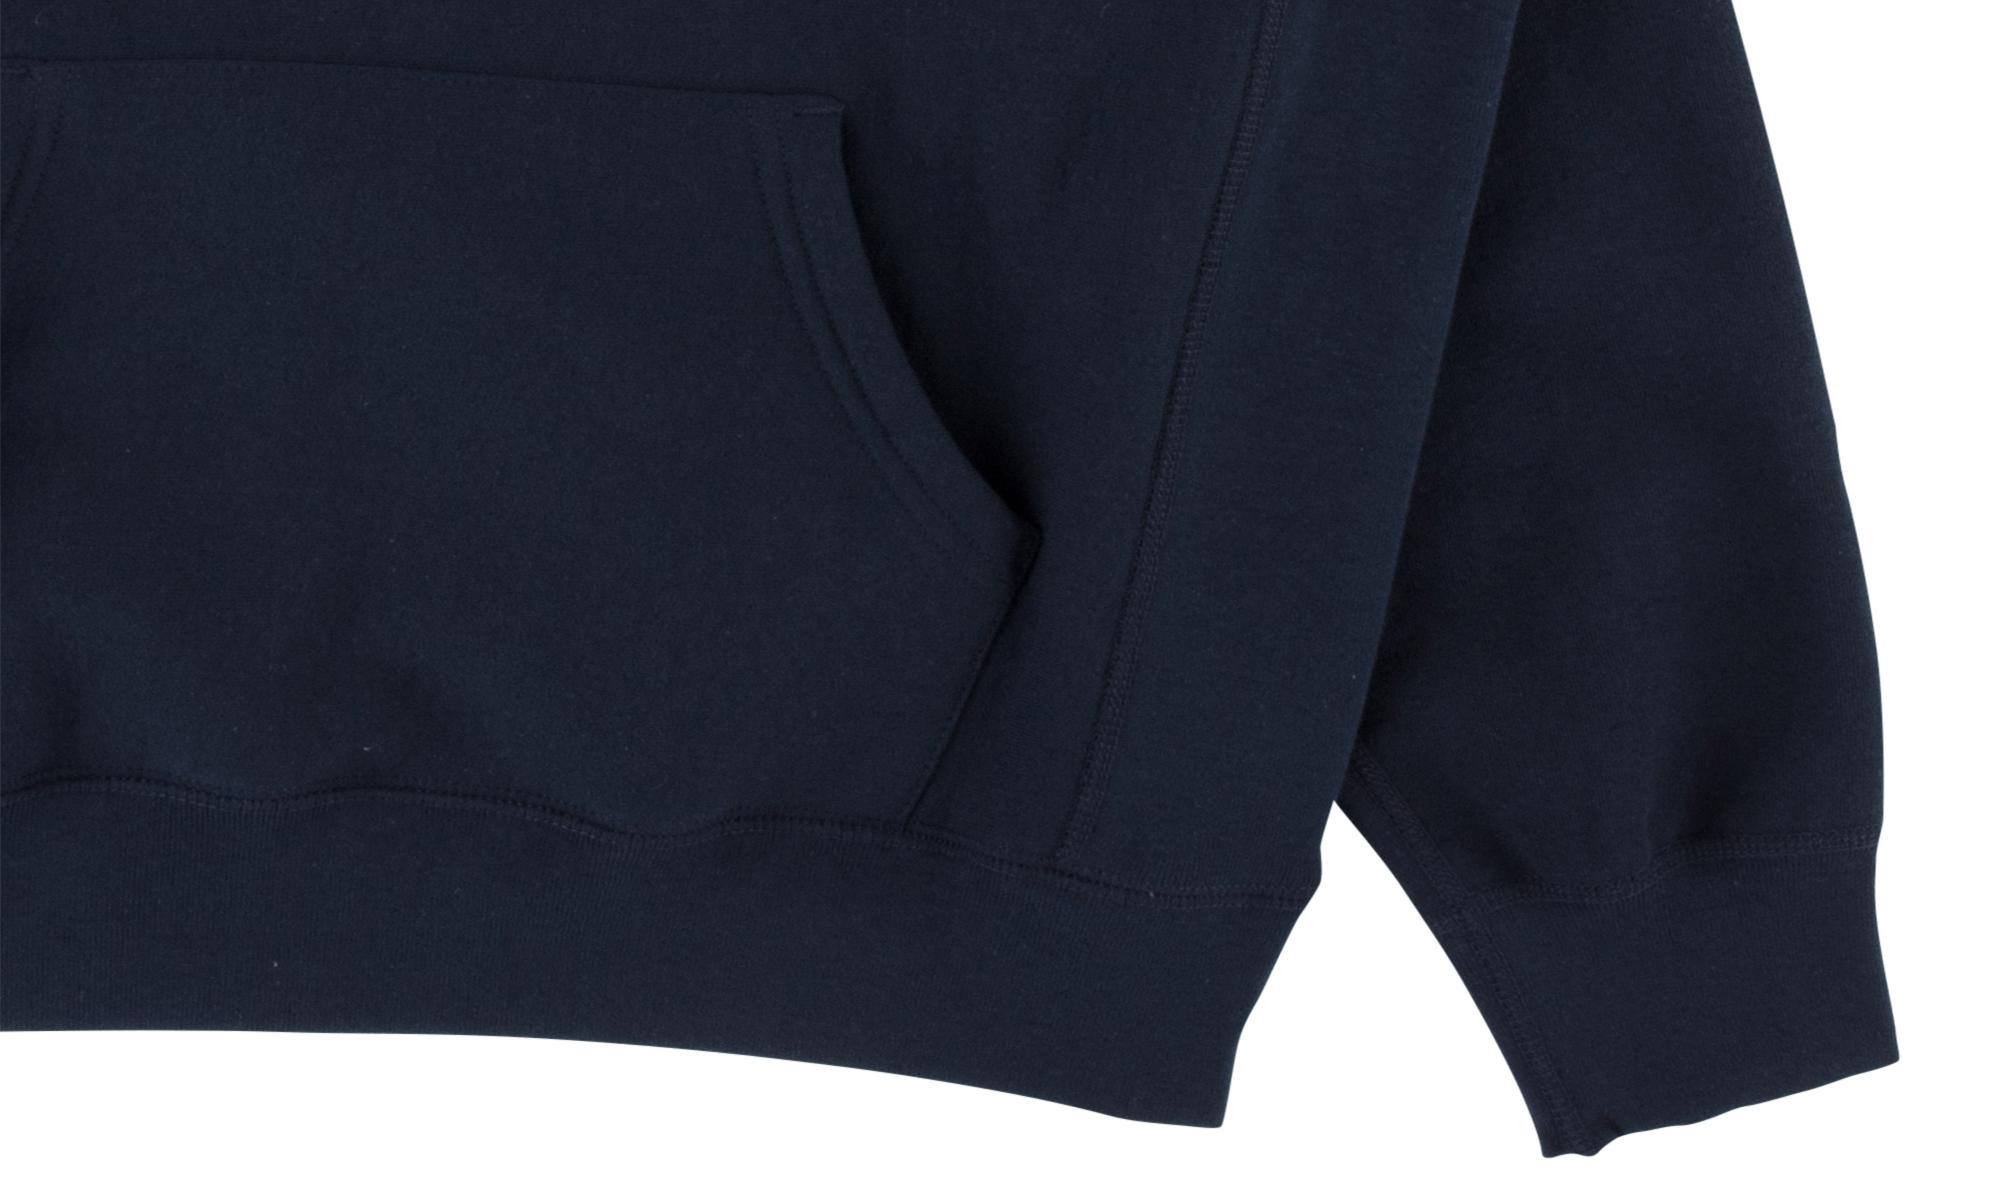 737abf889217 Supreme - Blue Cord Collegiate Logo Hooded Sw for Men - Lyst. View  fullscreen